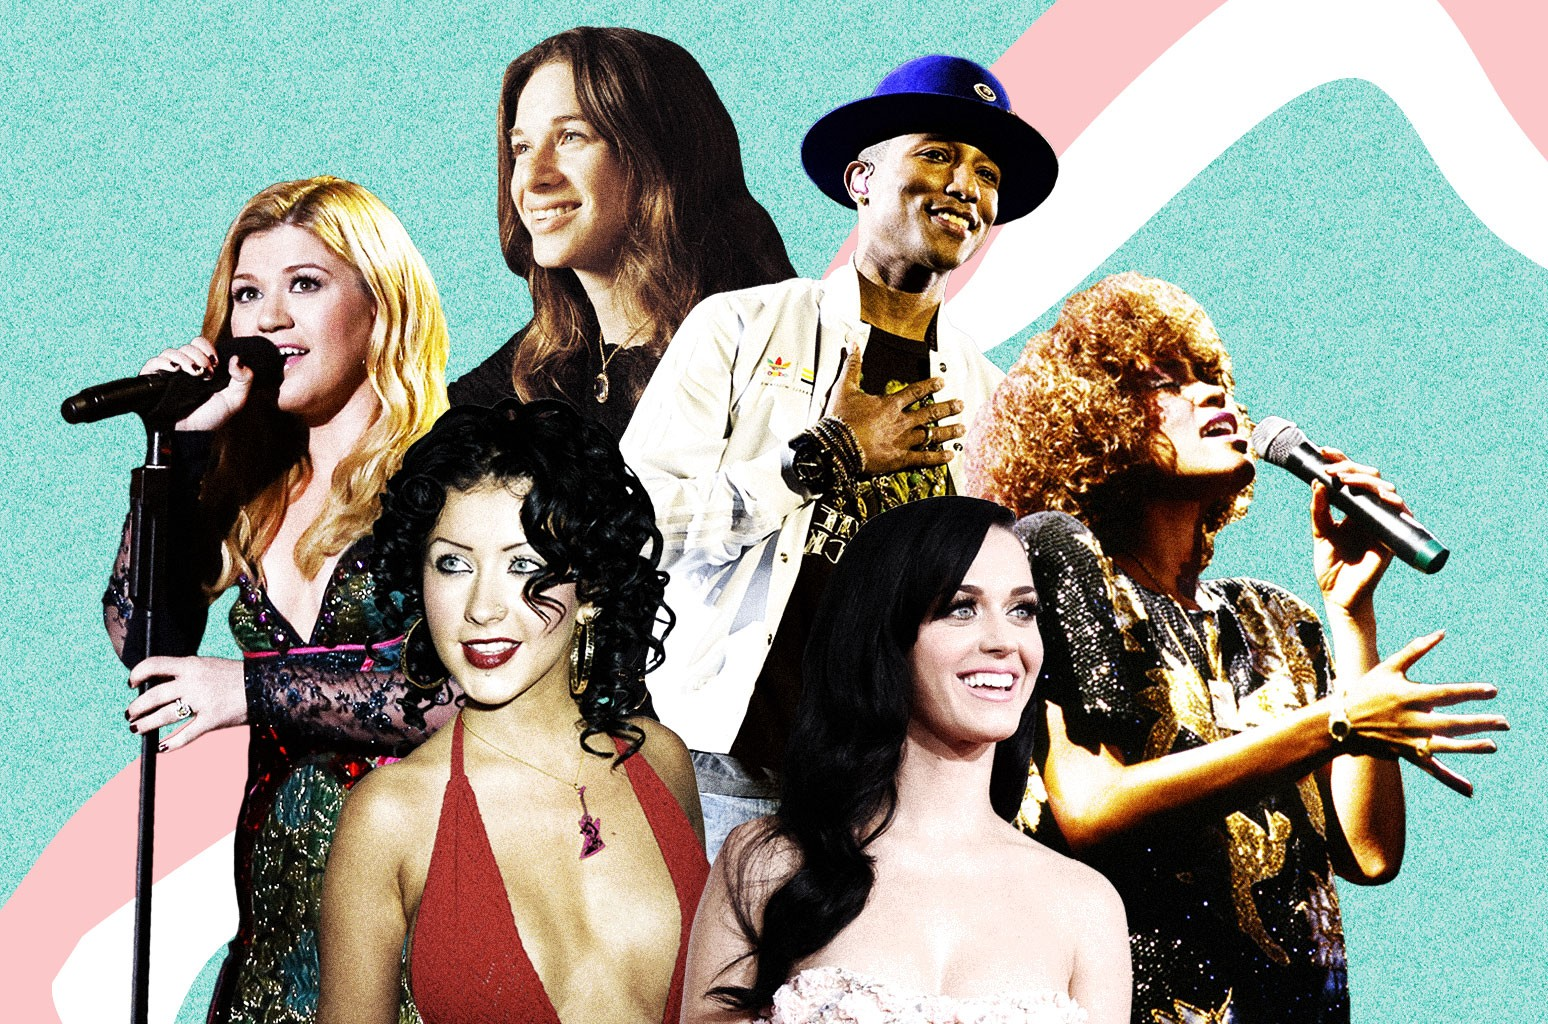 Kelly Clarkson, Carole King, Christina Aguilera, Katy Perry, Pharrell Williams, Whitney Houston